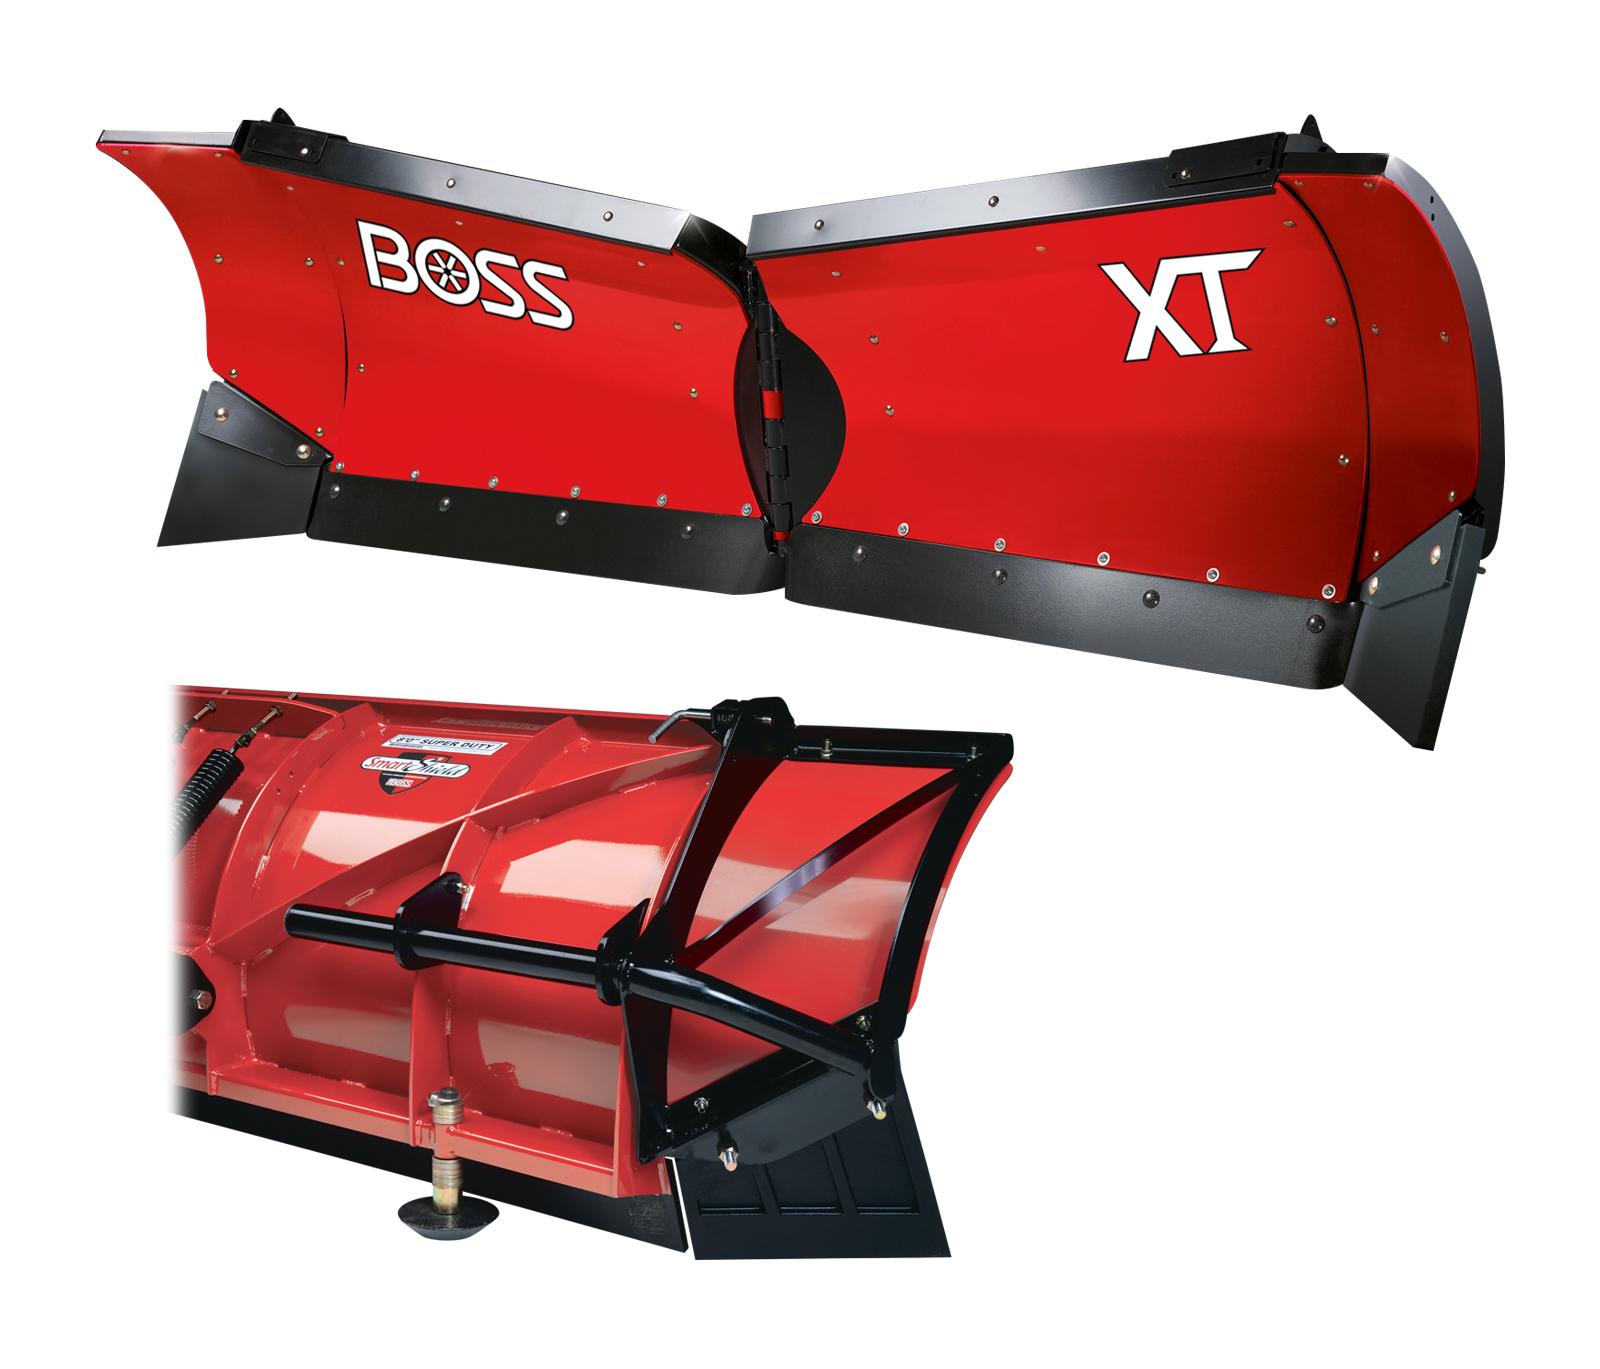 boss snow plows camper trailer wiring diagram snowplow truck equipment accessories